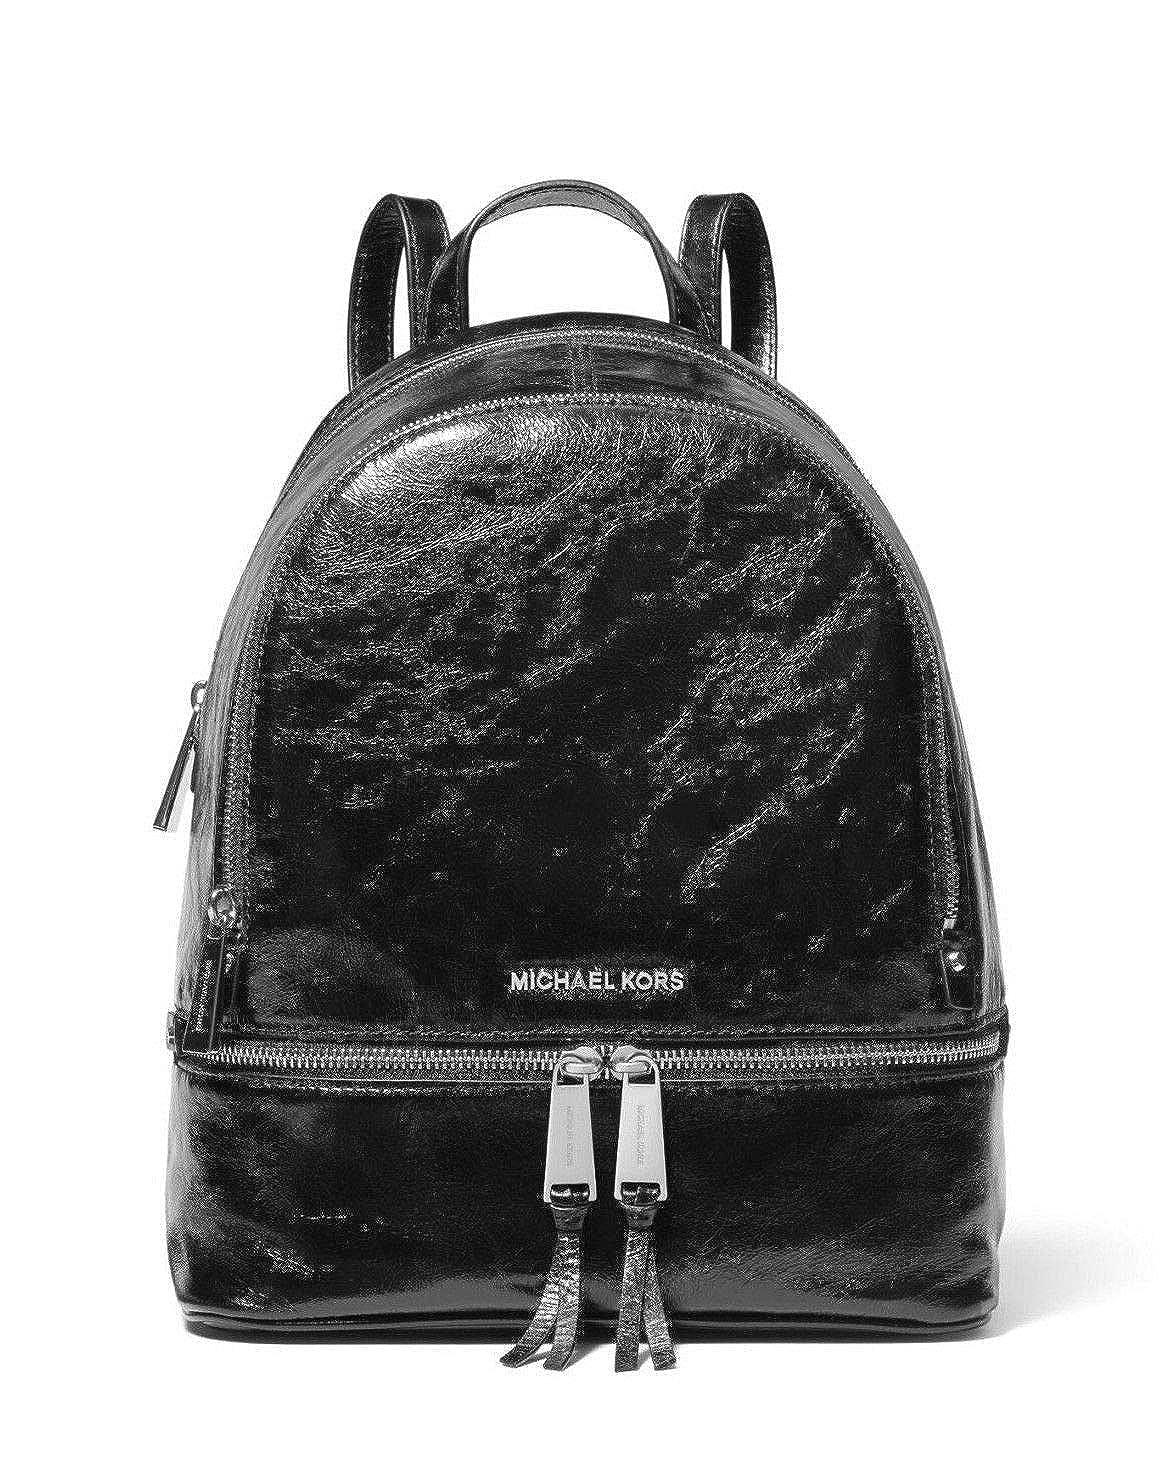 1304dbe8869a Amazon.com: MICHAEL Michael Kors Rhea Medium Crinkled Calf Leather Backpack  in Black: Shoes